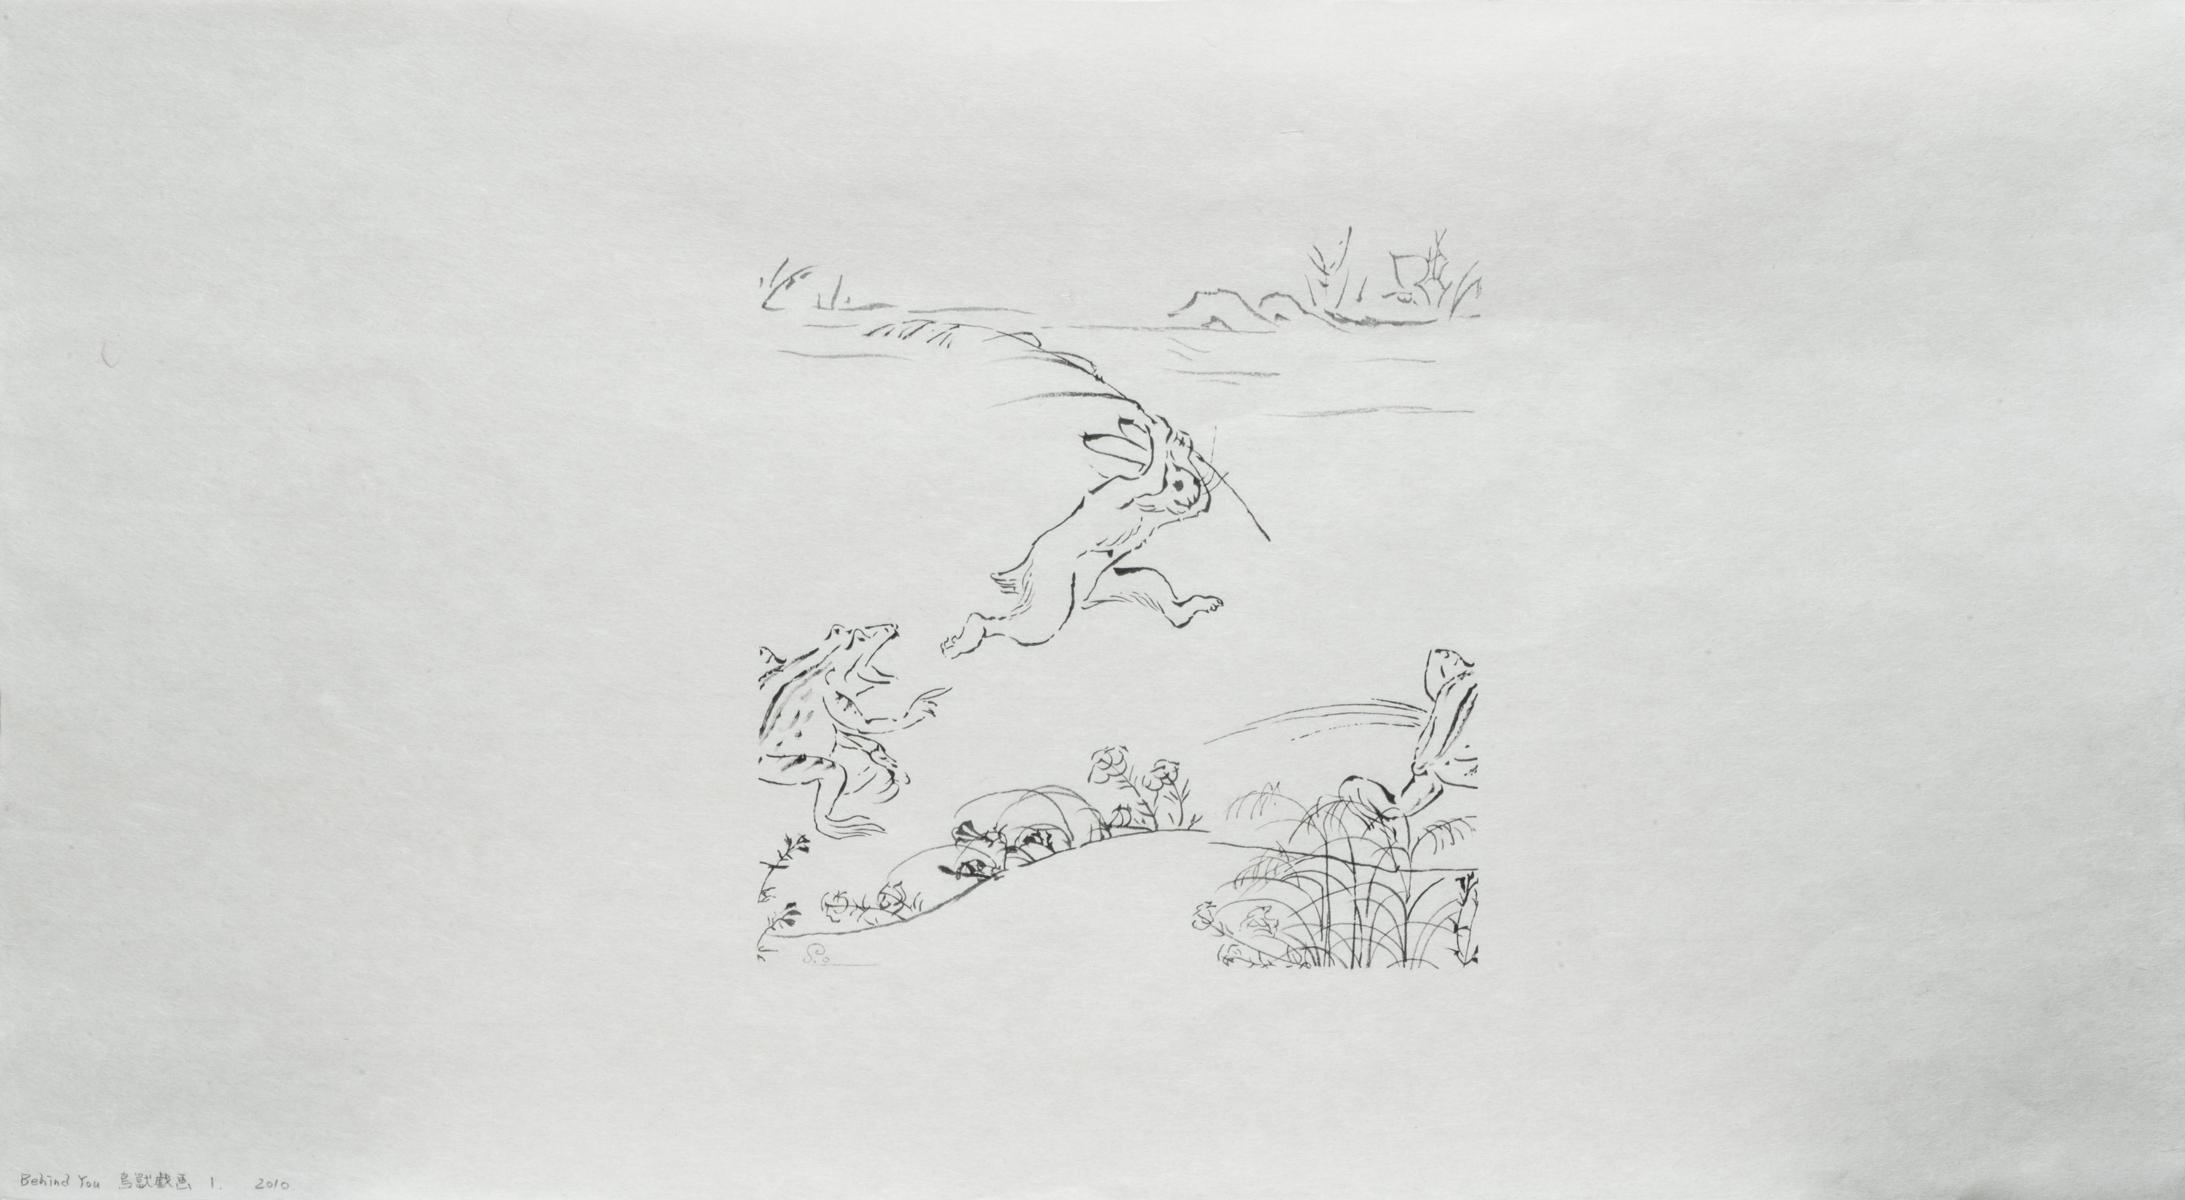 BEHIND YOU: the wildlife cartoon Shinji Ogawa